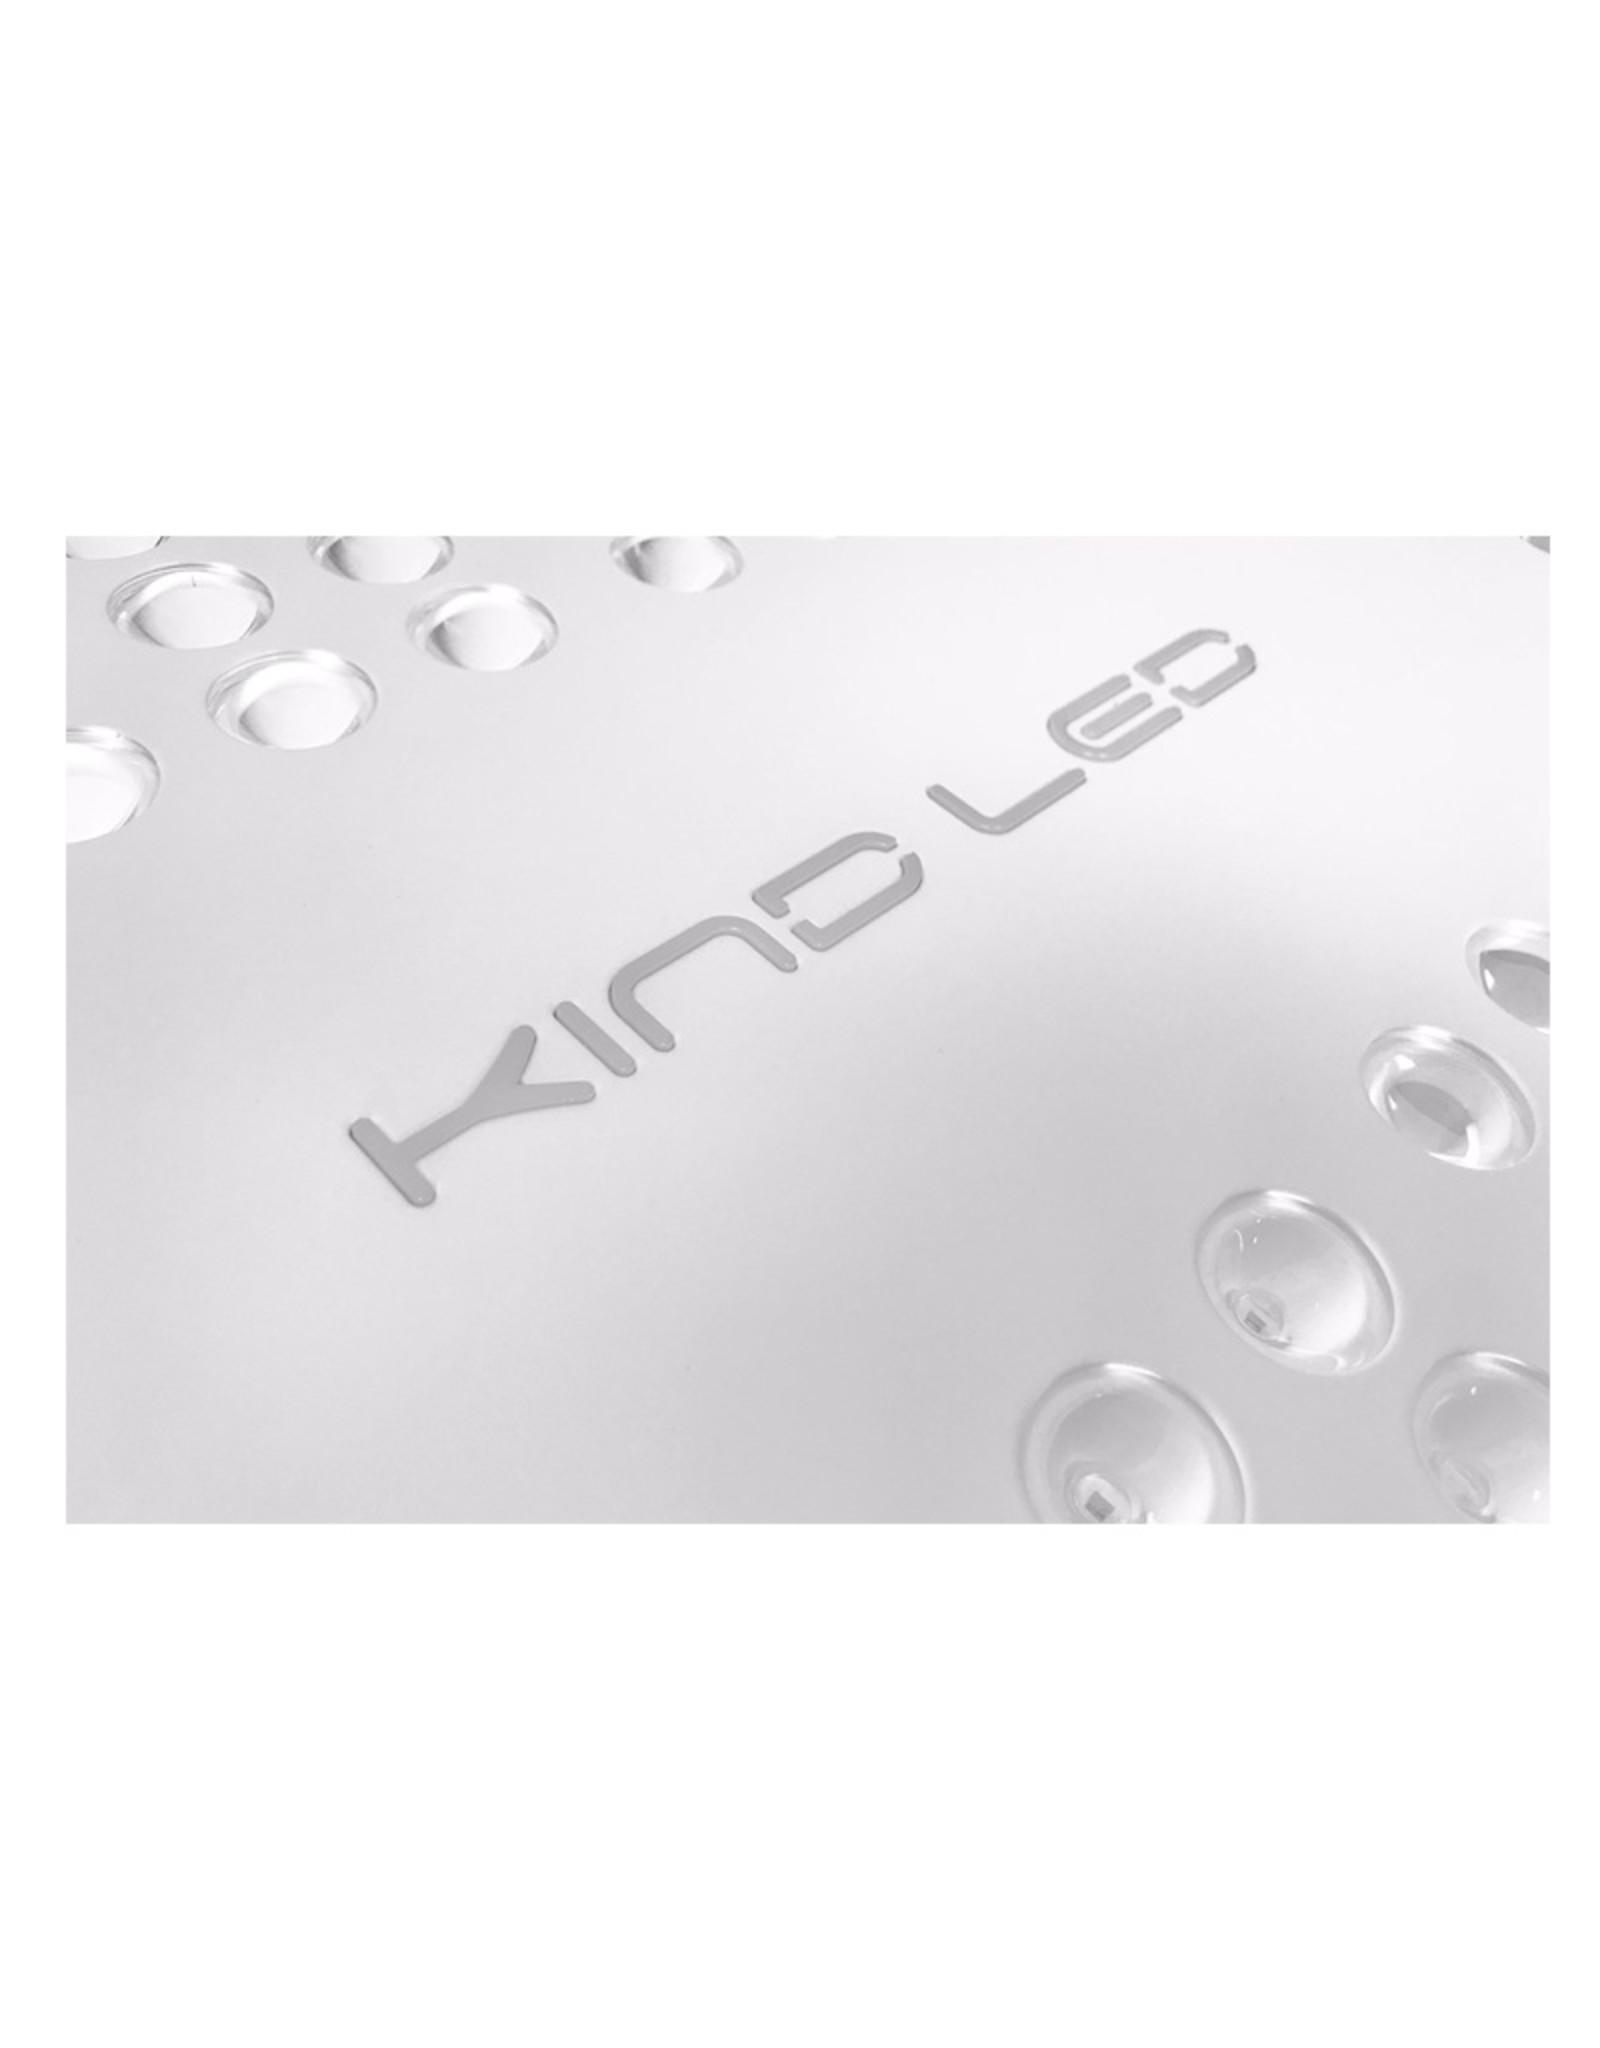 KIND LED KIND LED K3 Series 2 XL 600